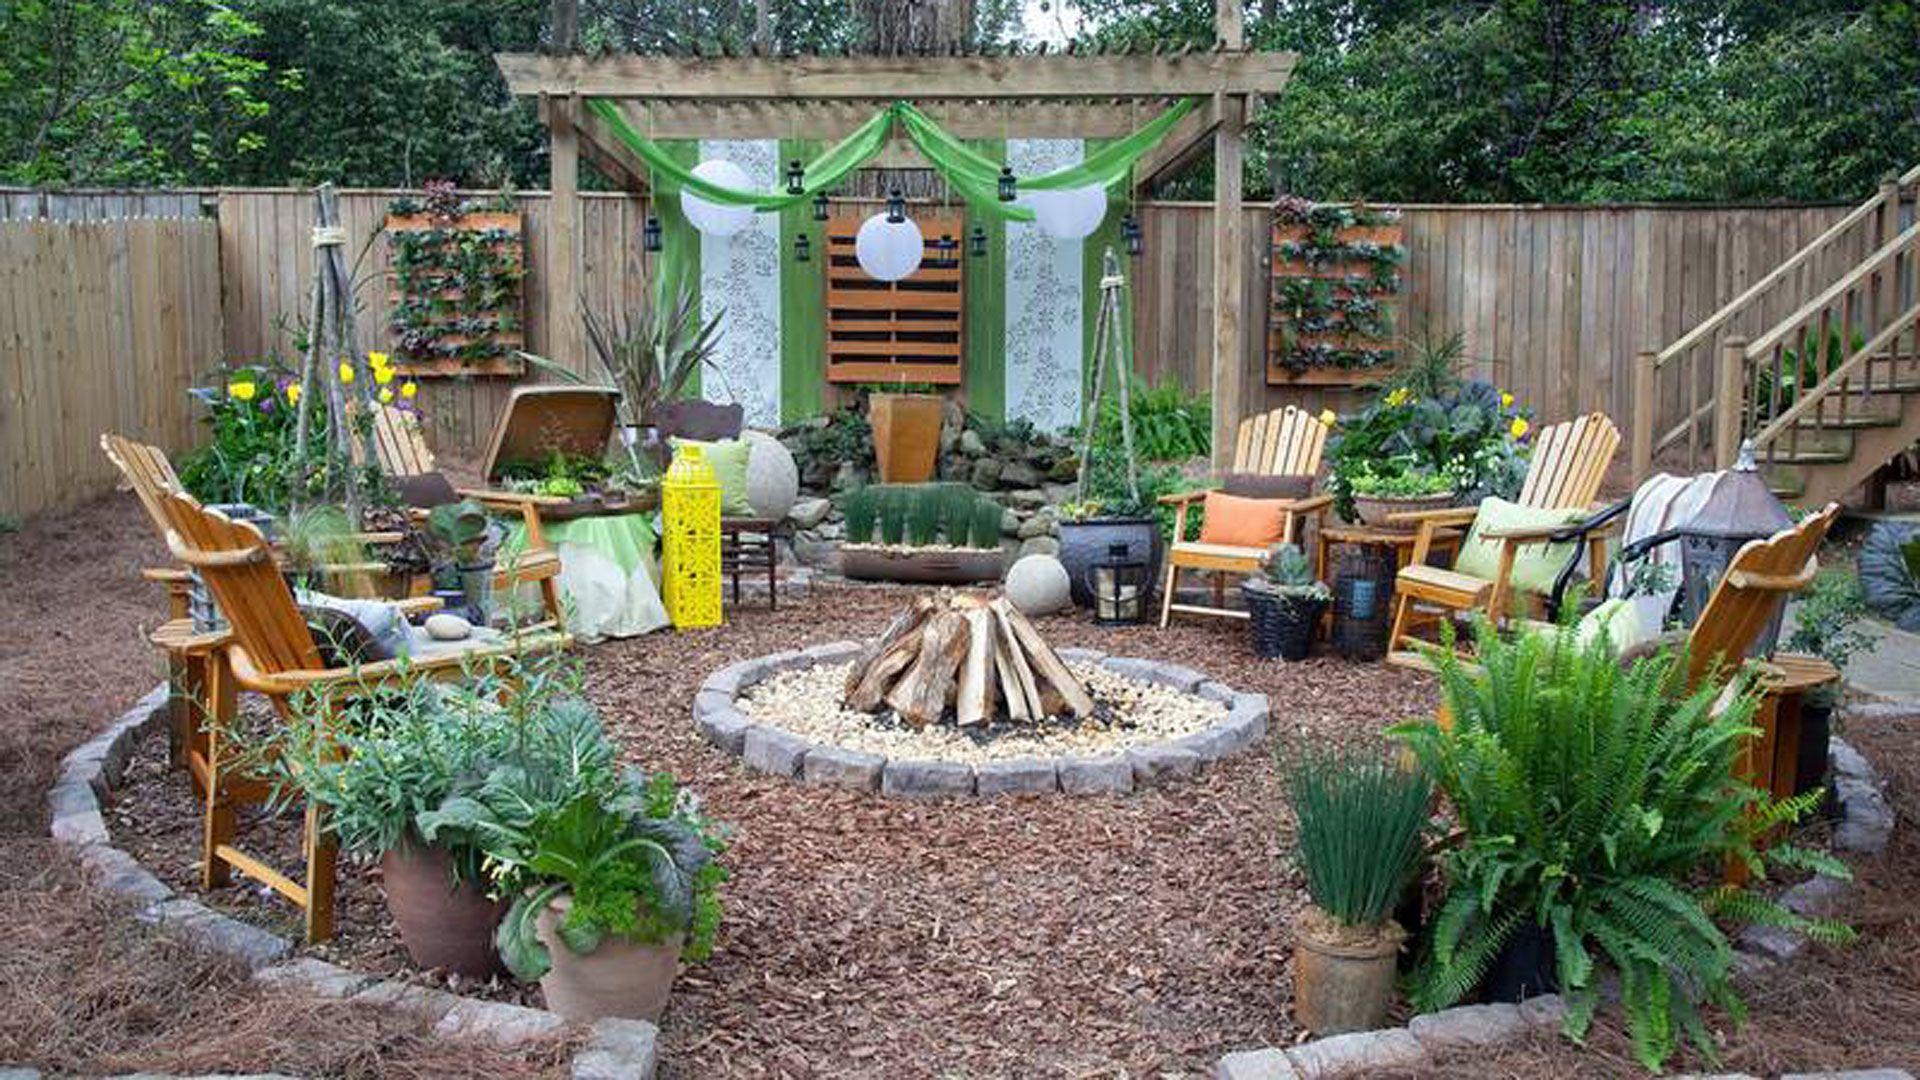 Wonderful Backyard Oasis - Beautiful Backyard Ideas KJ26